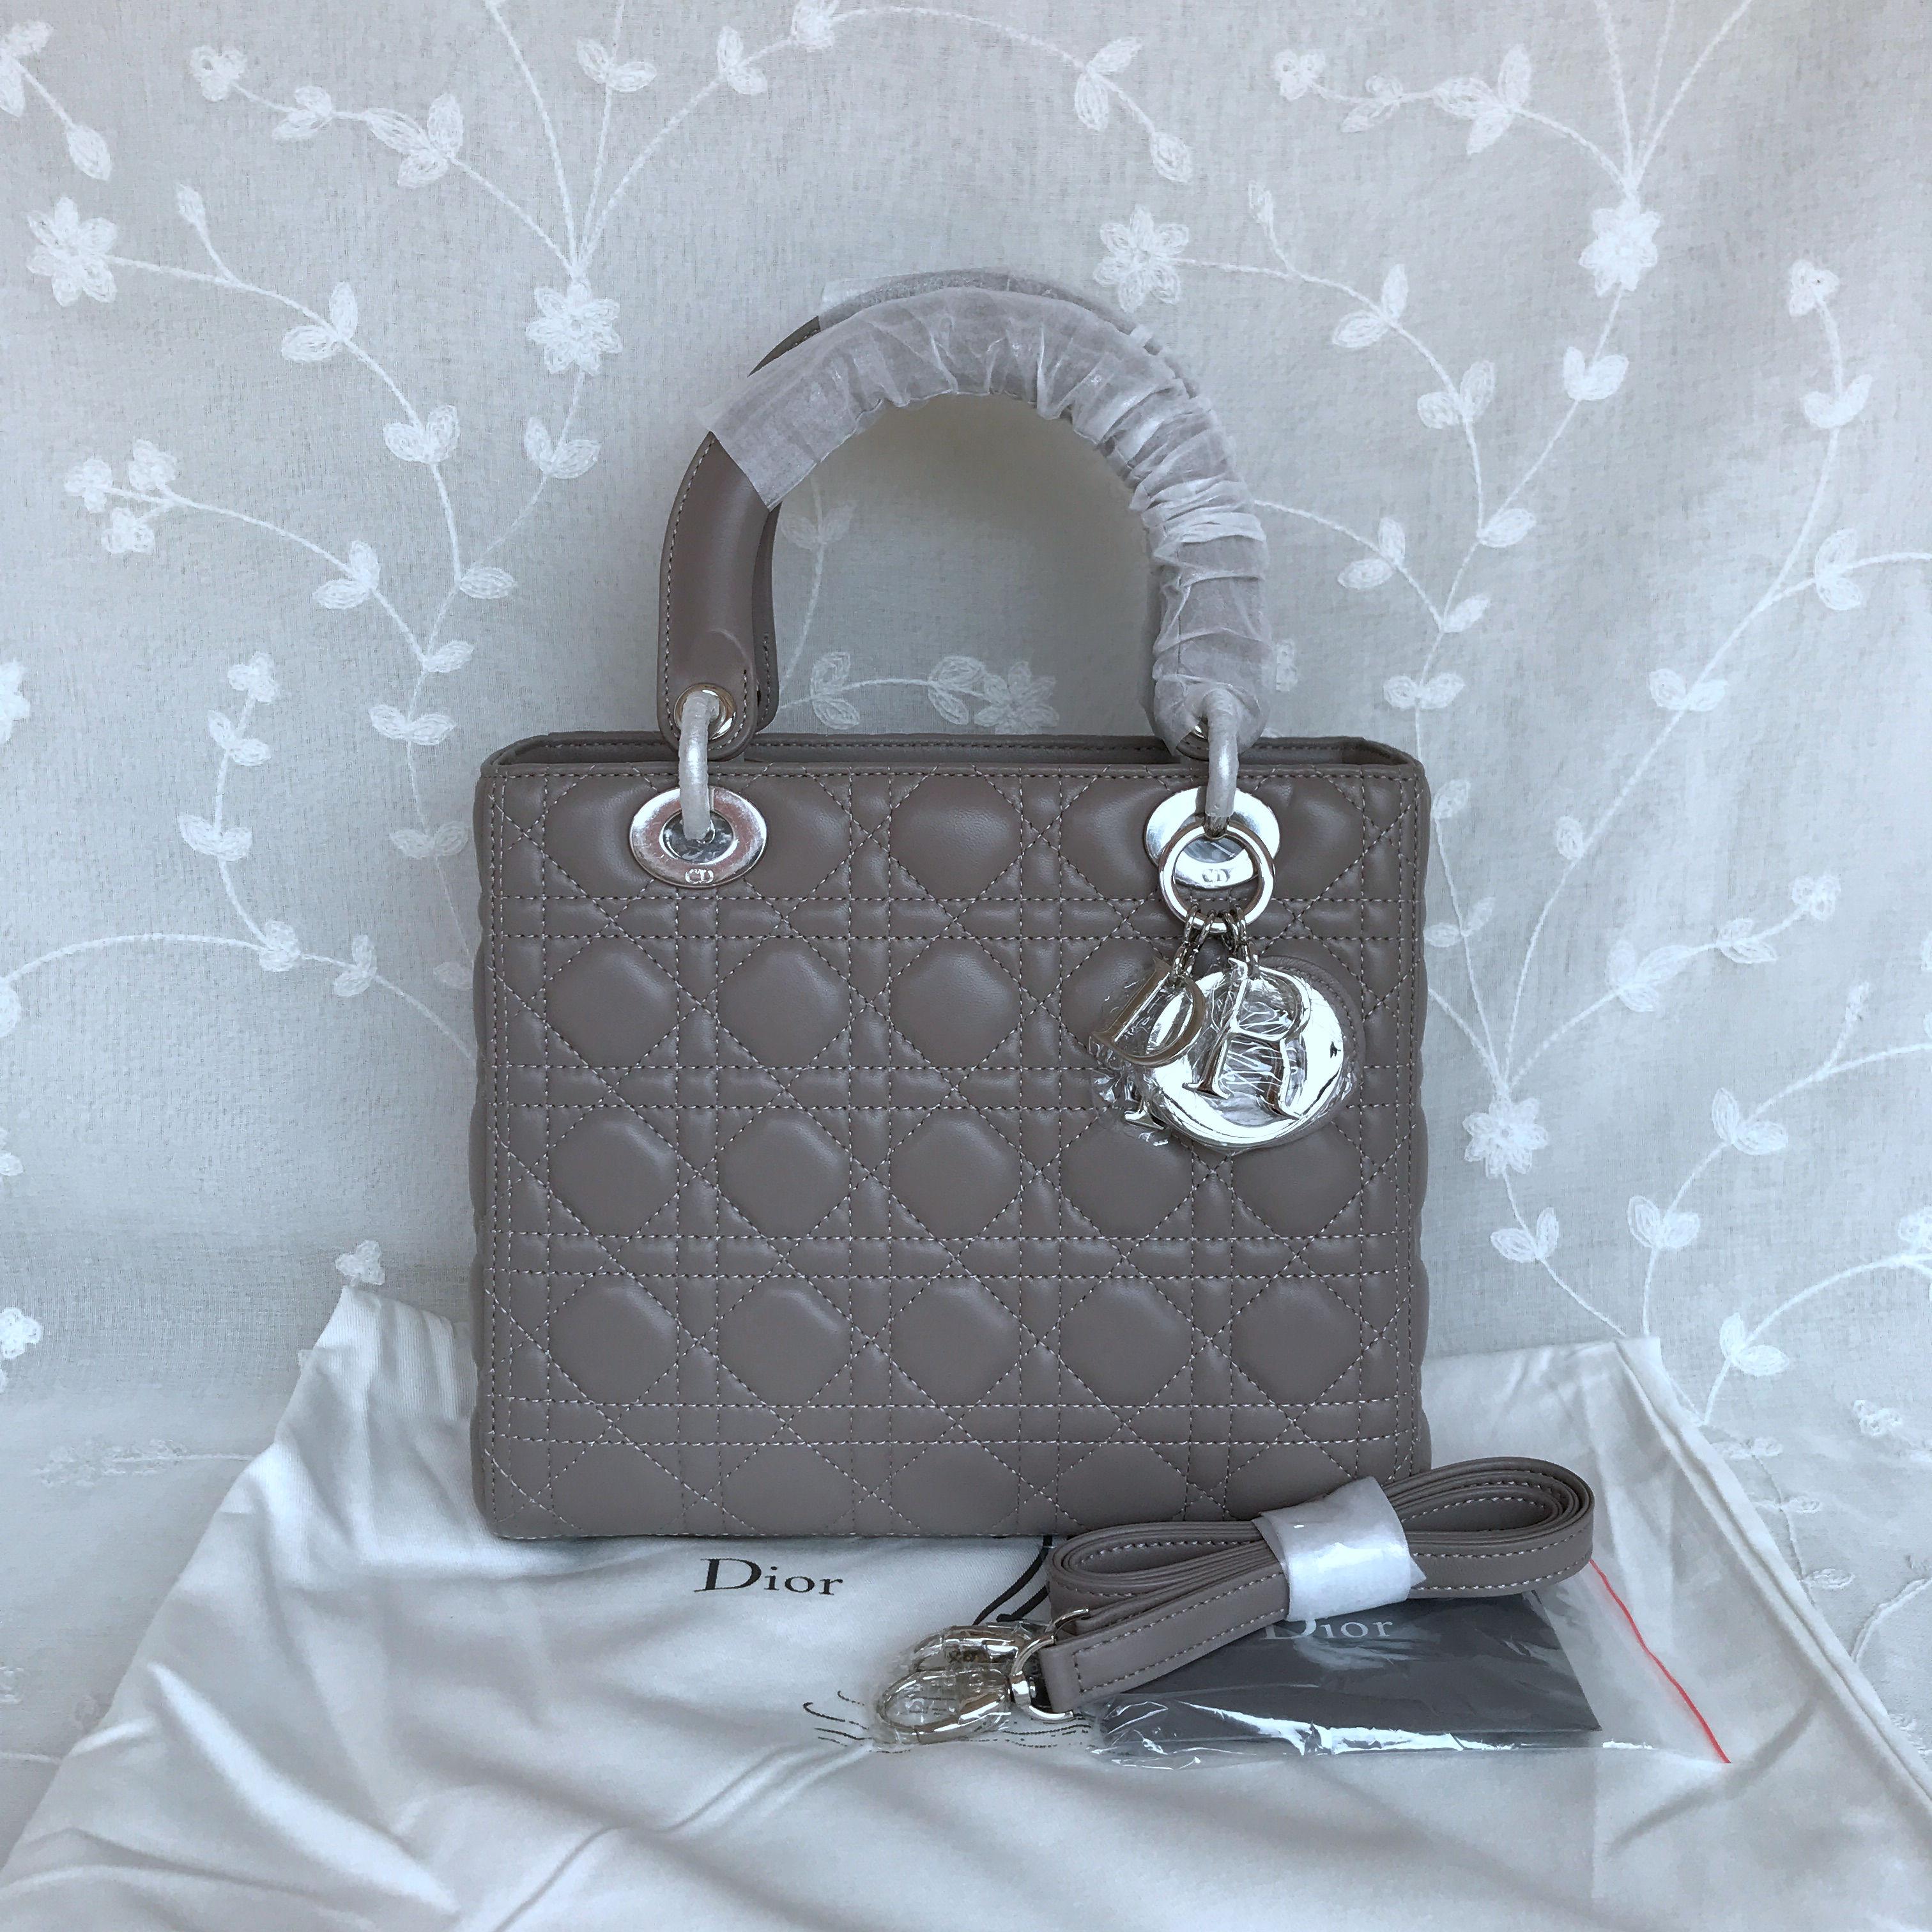 LADY DIOR ULTRA-MATTE BAG 24cm 44550